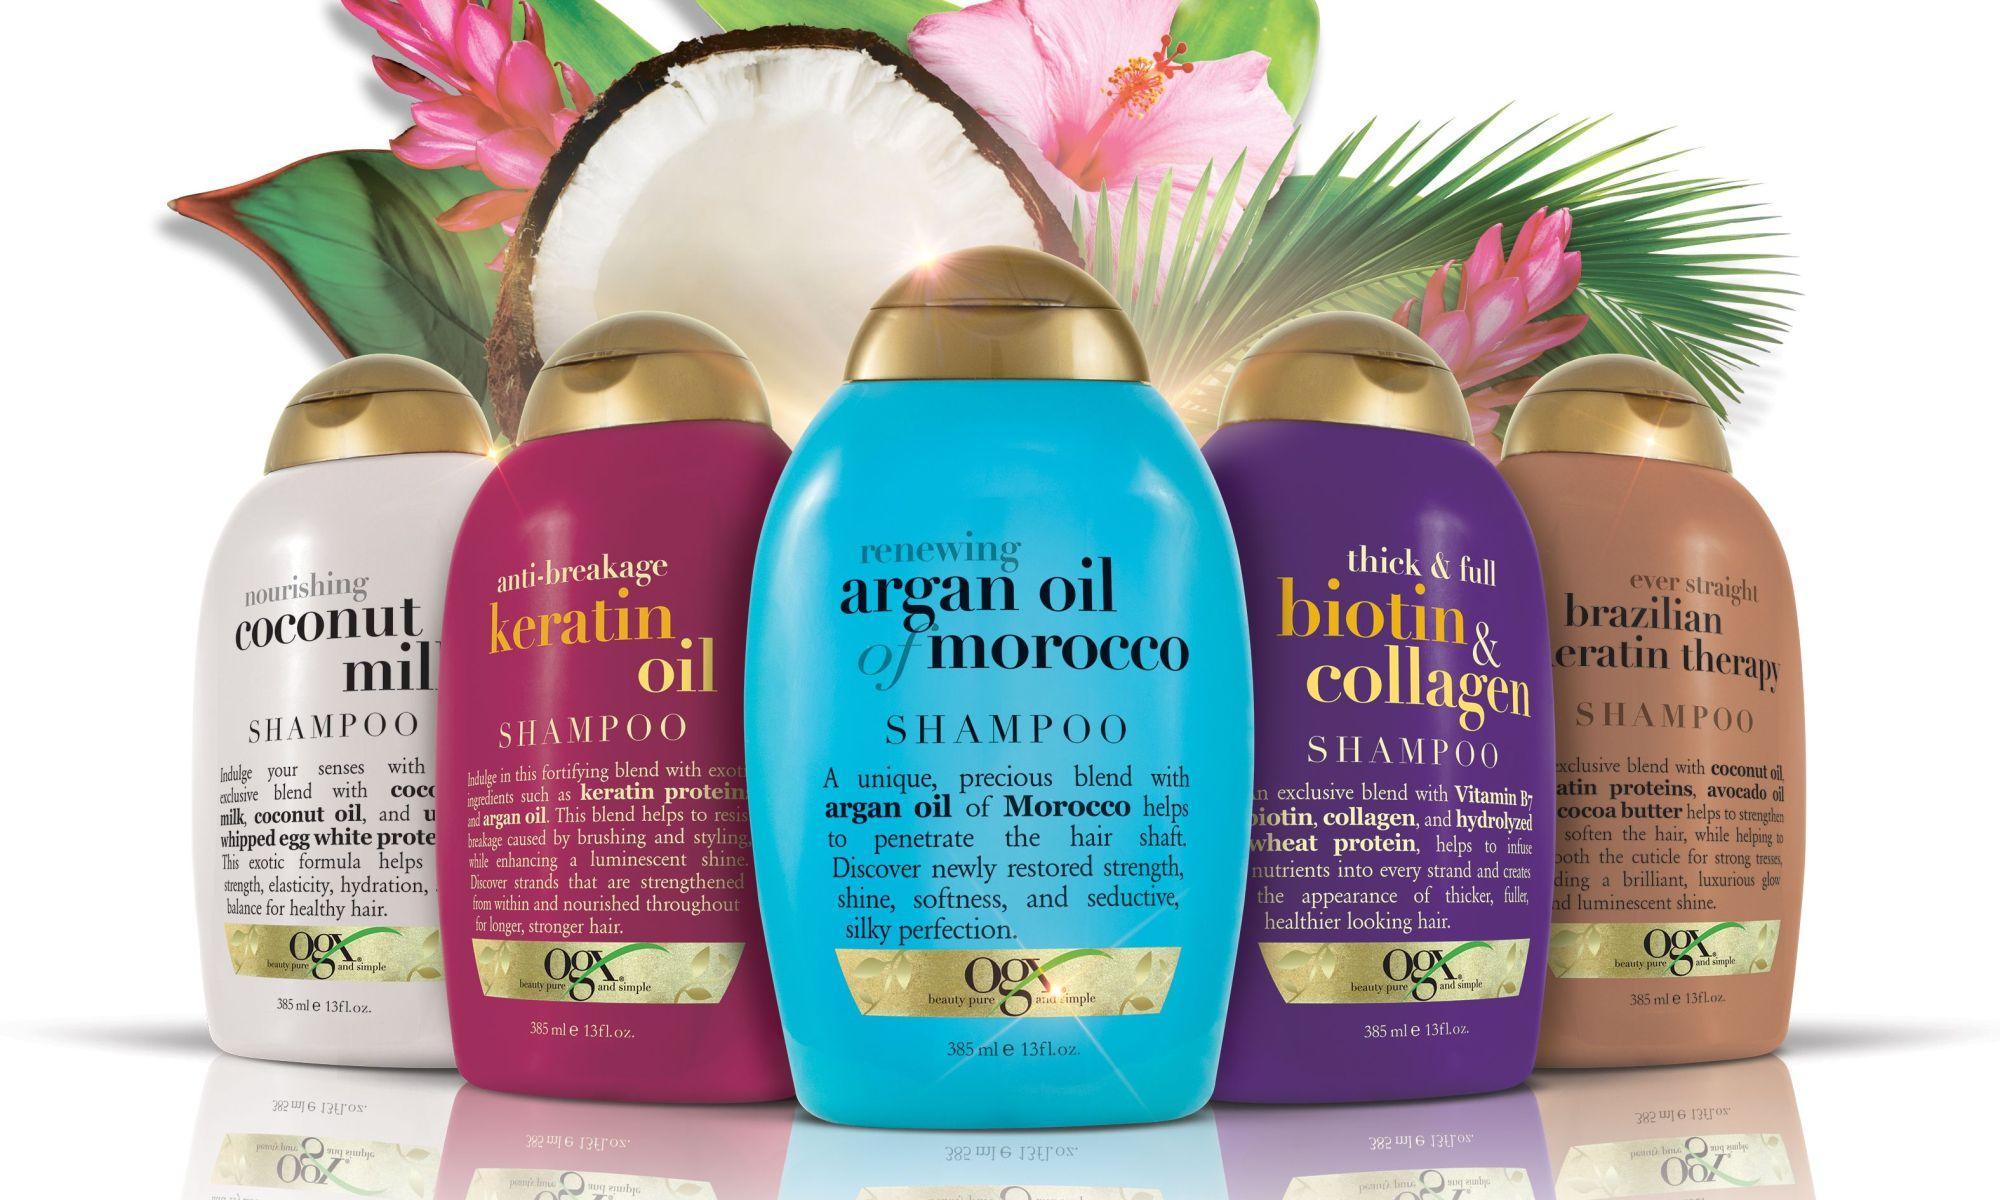 Shampoo OGX